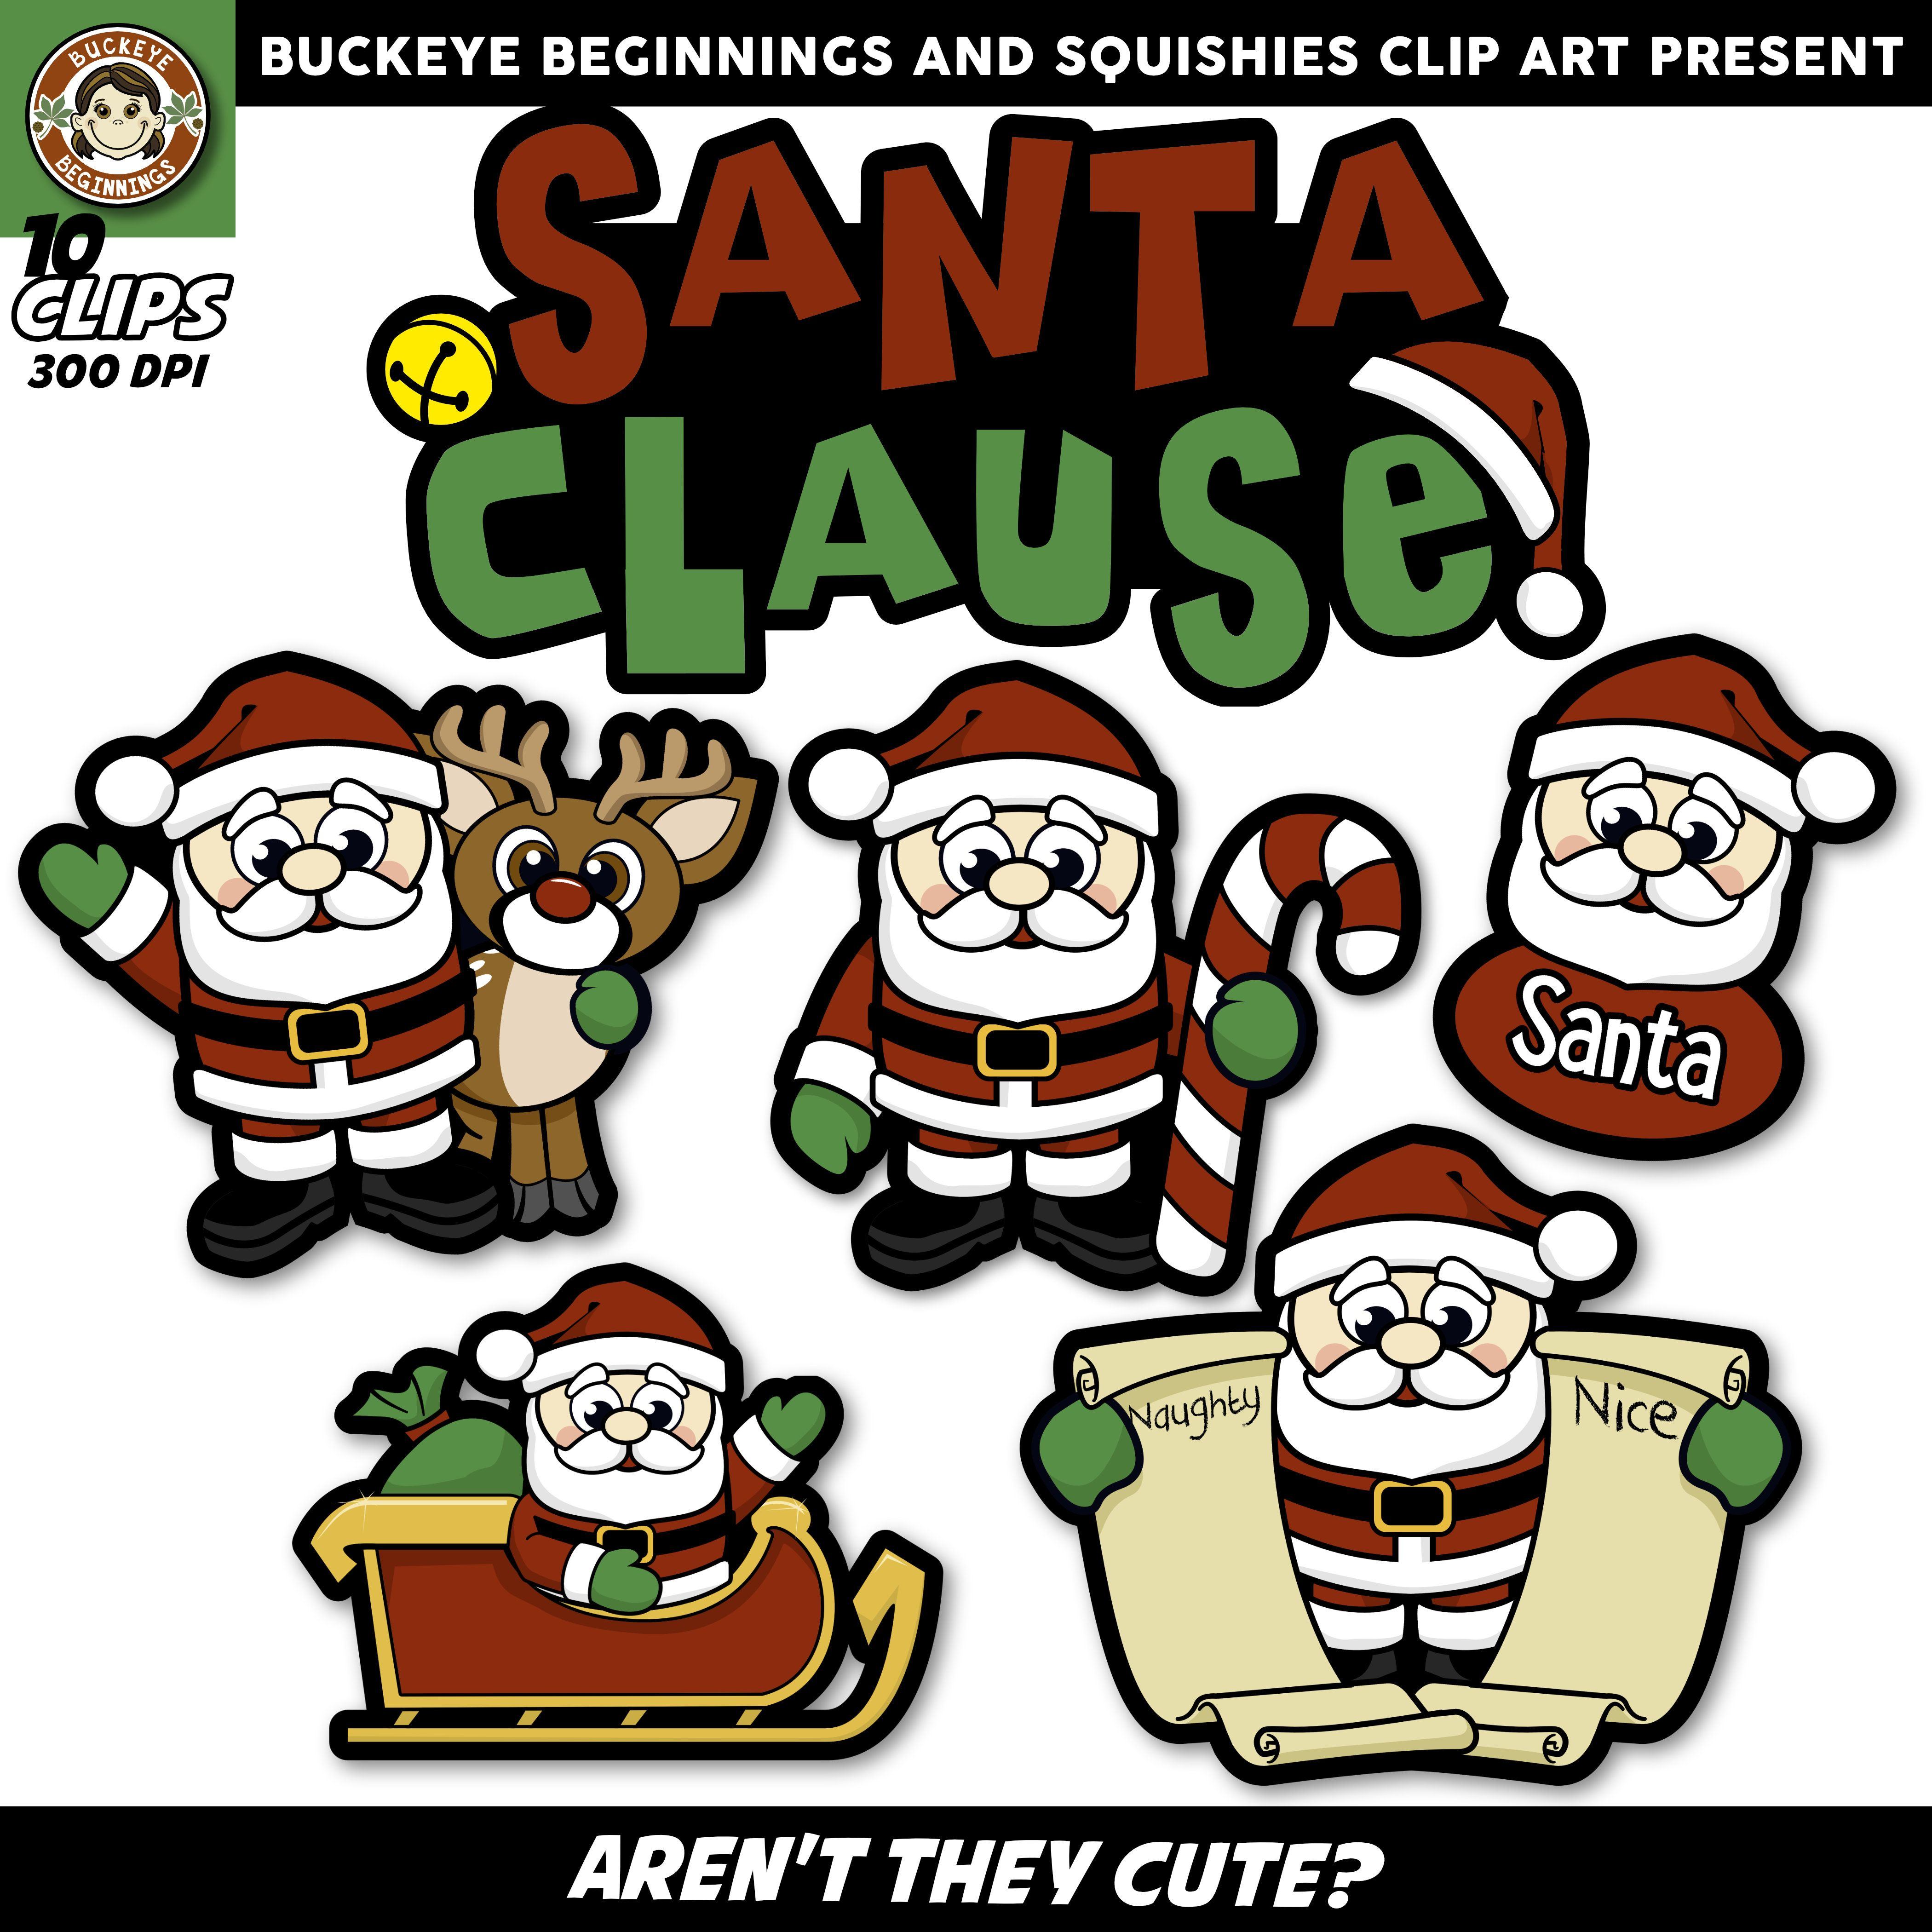 santa clause clip art squishies clipart  [ 4200 x 4200 Pixel ]